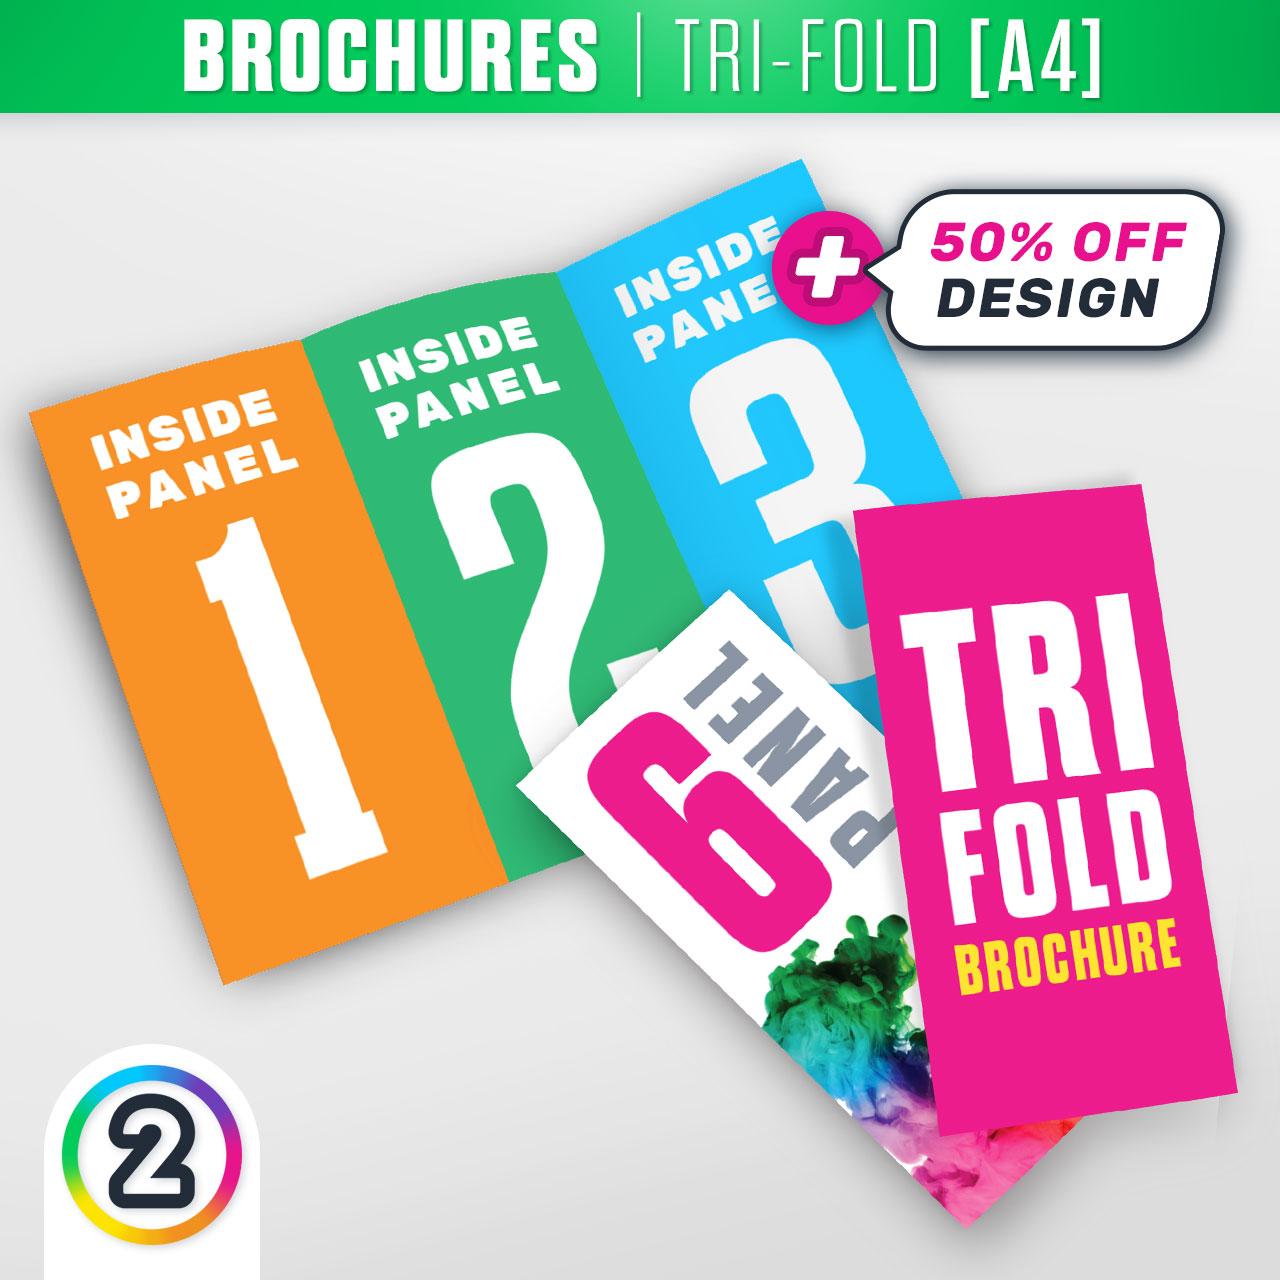 Product Tri Fold Brochure: Order Tri-Fold A4 Brochures Online Australia